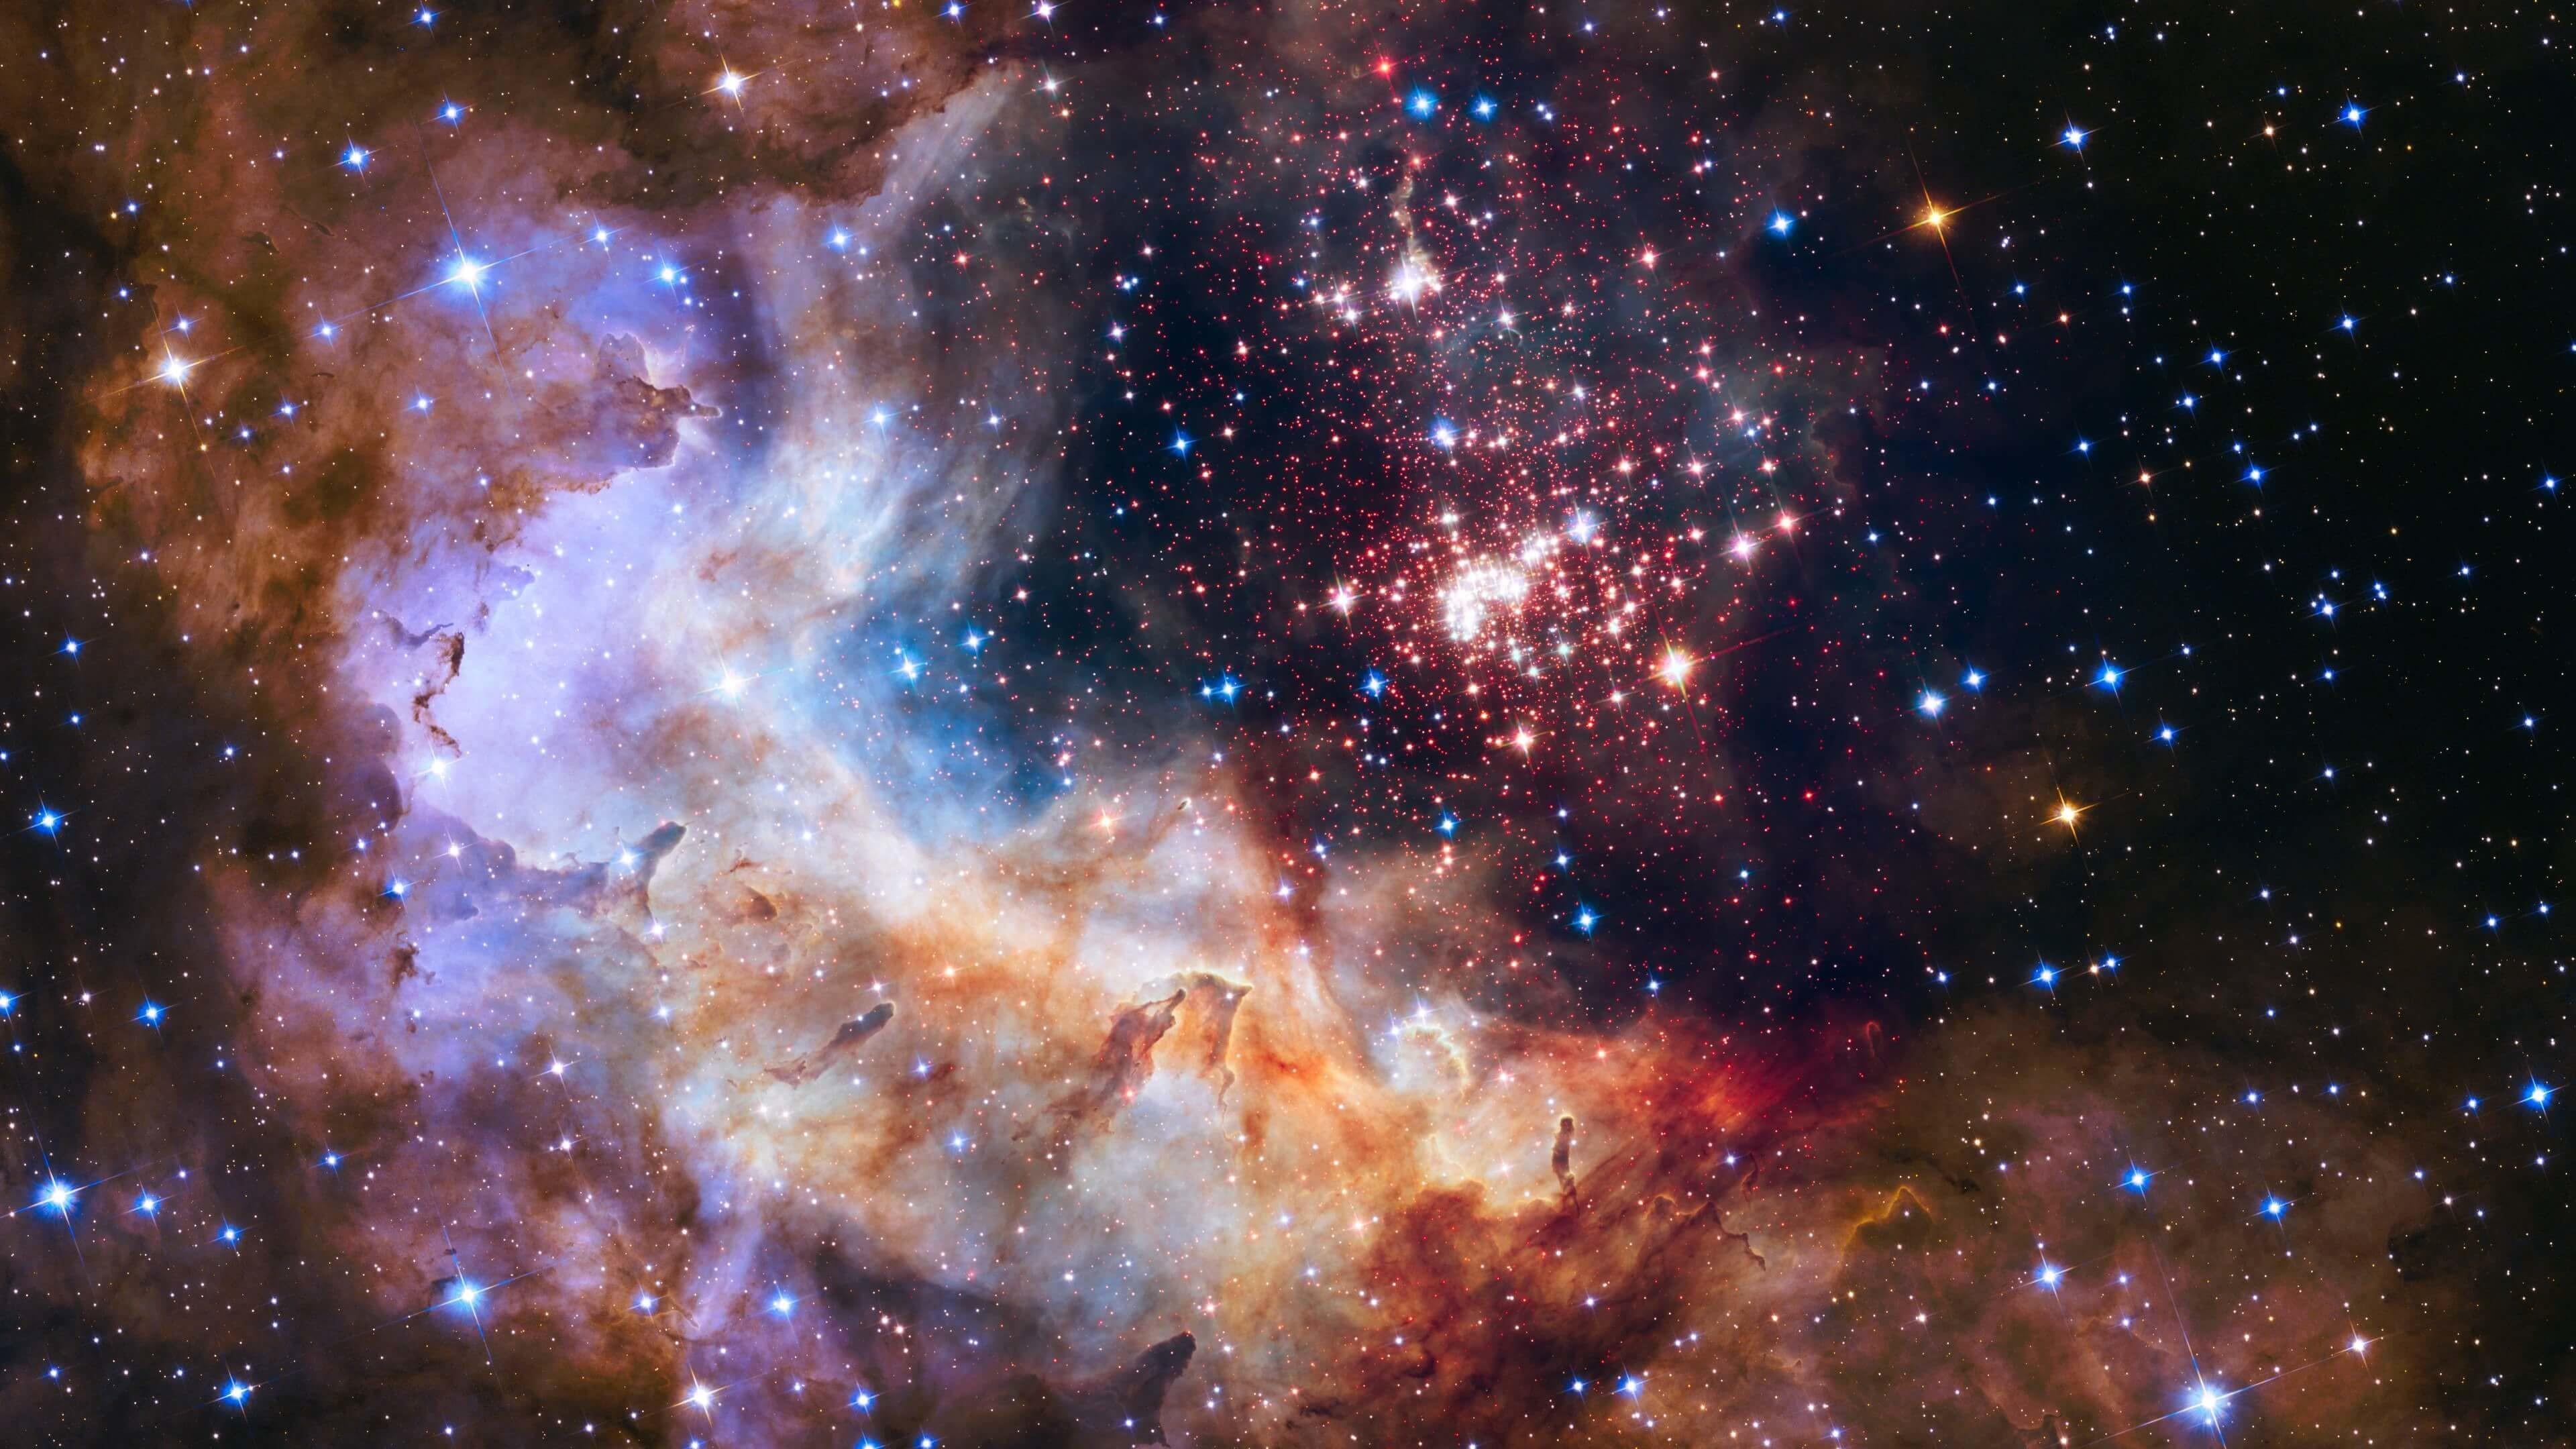 Celestial Fireworks Hubble 25th Anniversary 4K Wallpaper